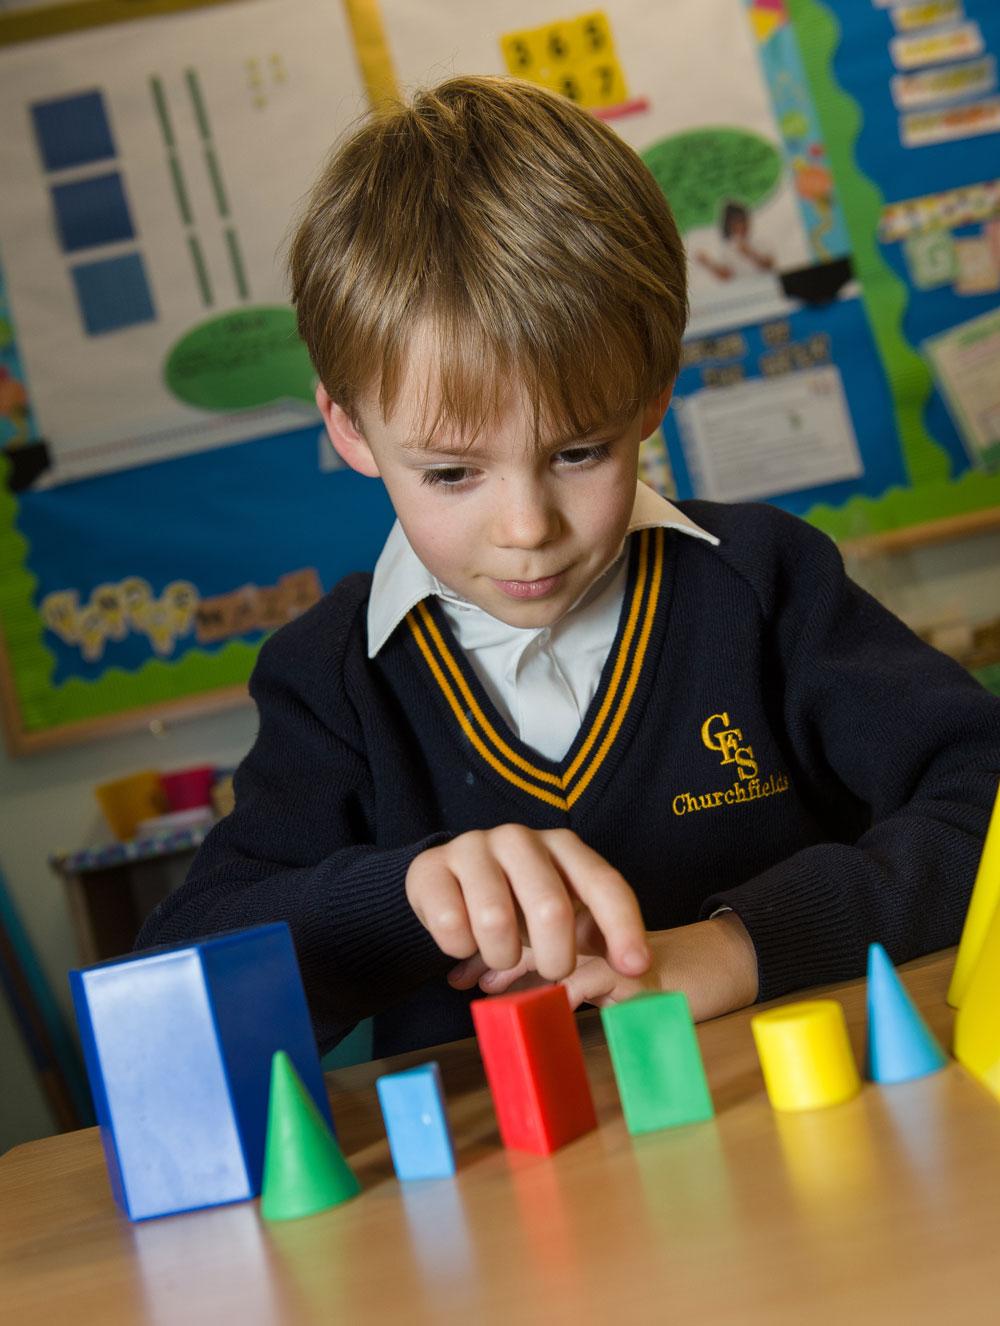 Boy pointing at green geometric shape